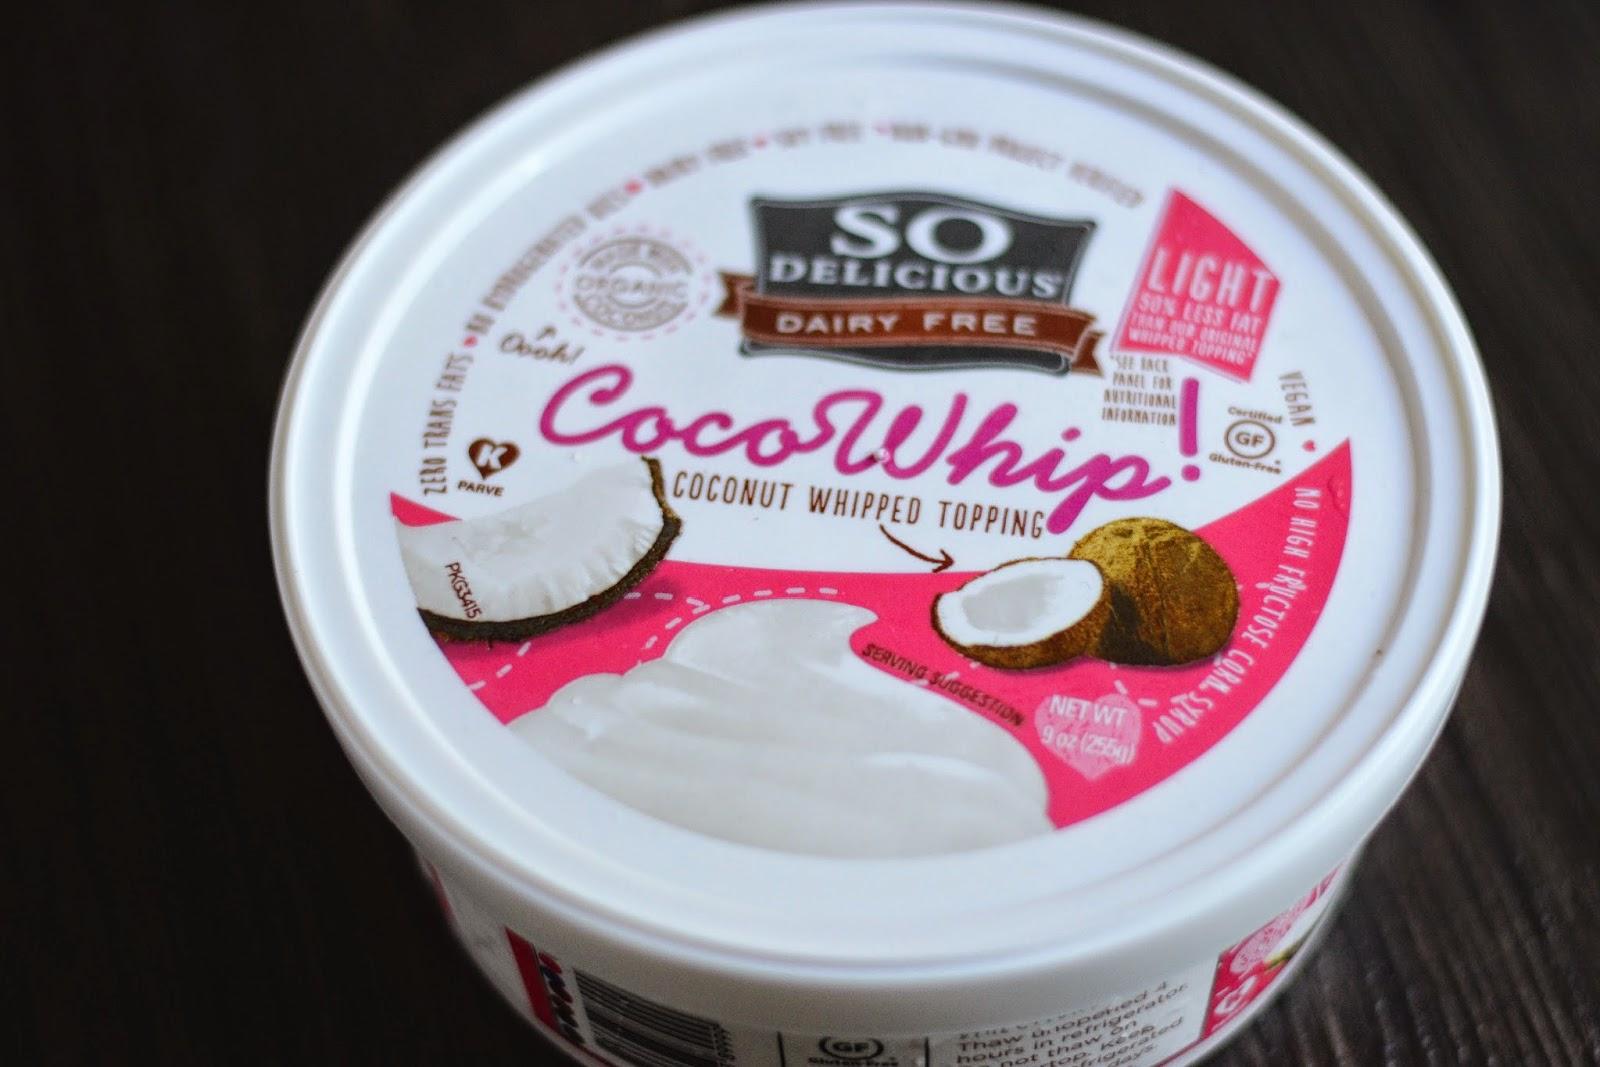 #cocowhip #vegan #coconut #whippedcream